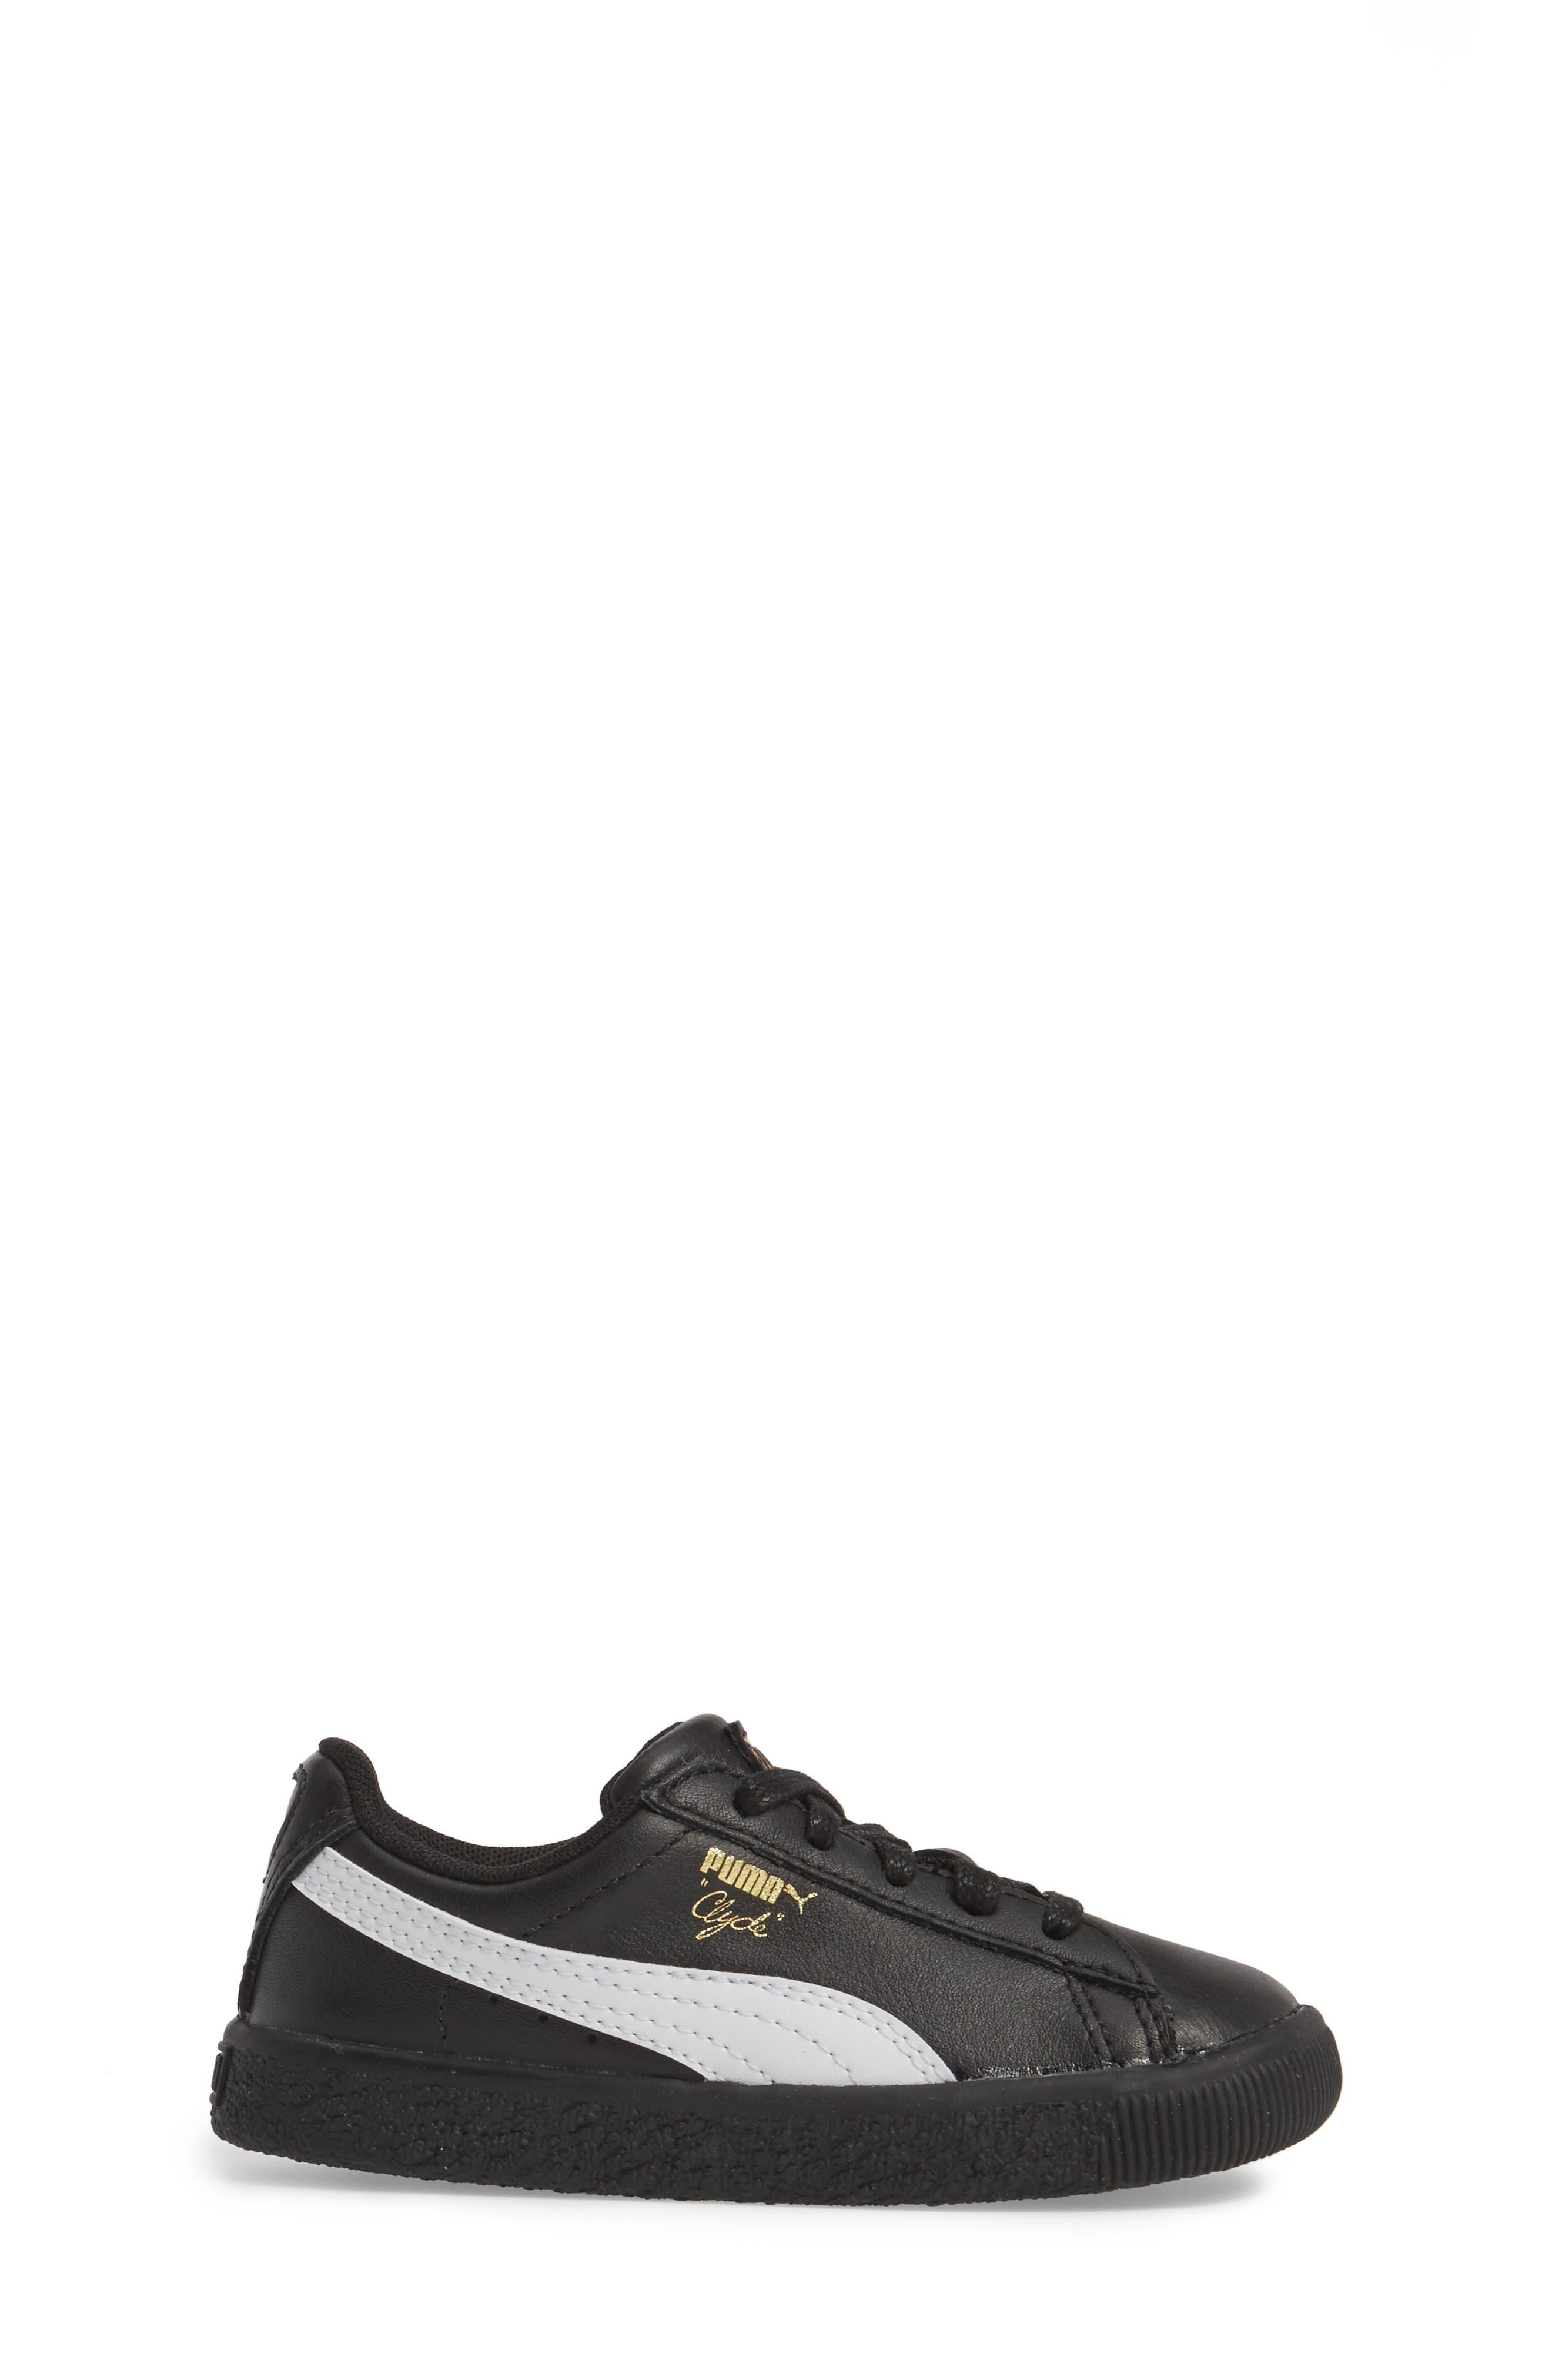 Alternate Image 3  - PUMA Clyde Core Foil Sneaker (Baby, Walker & Toddler)